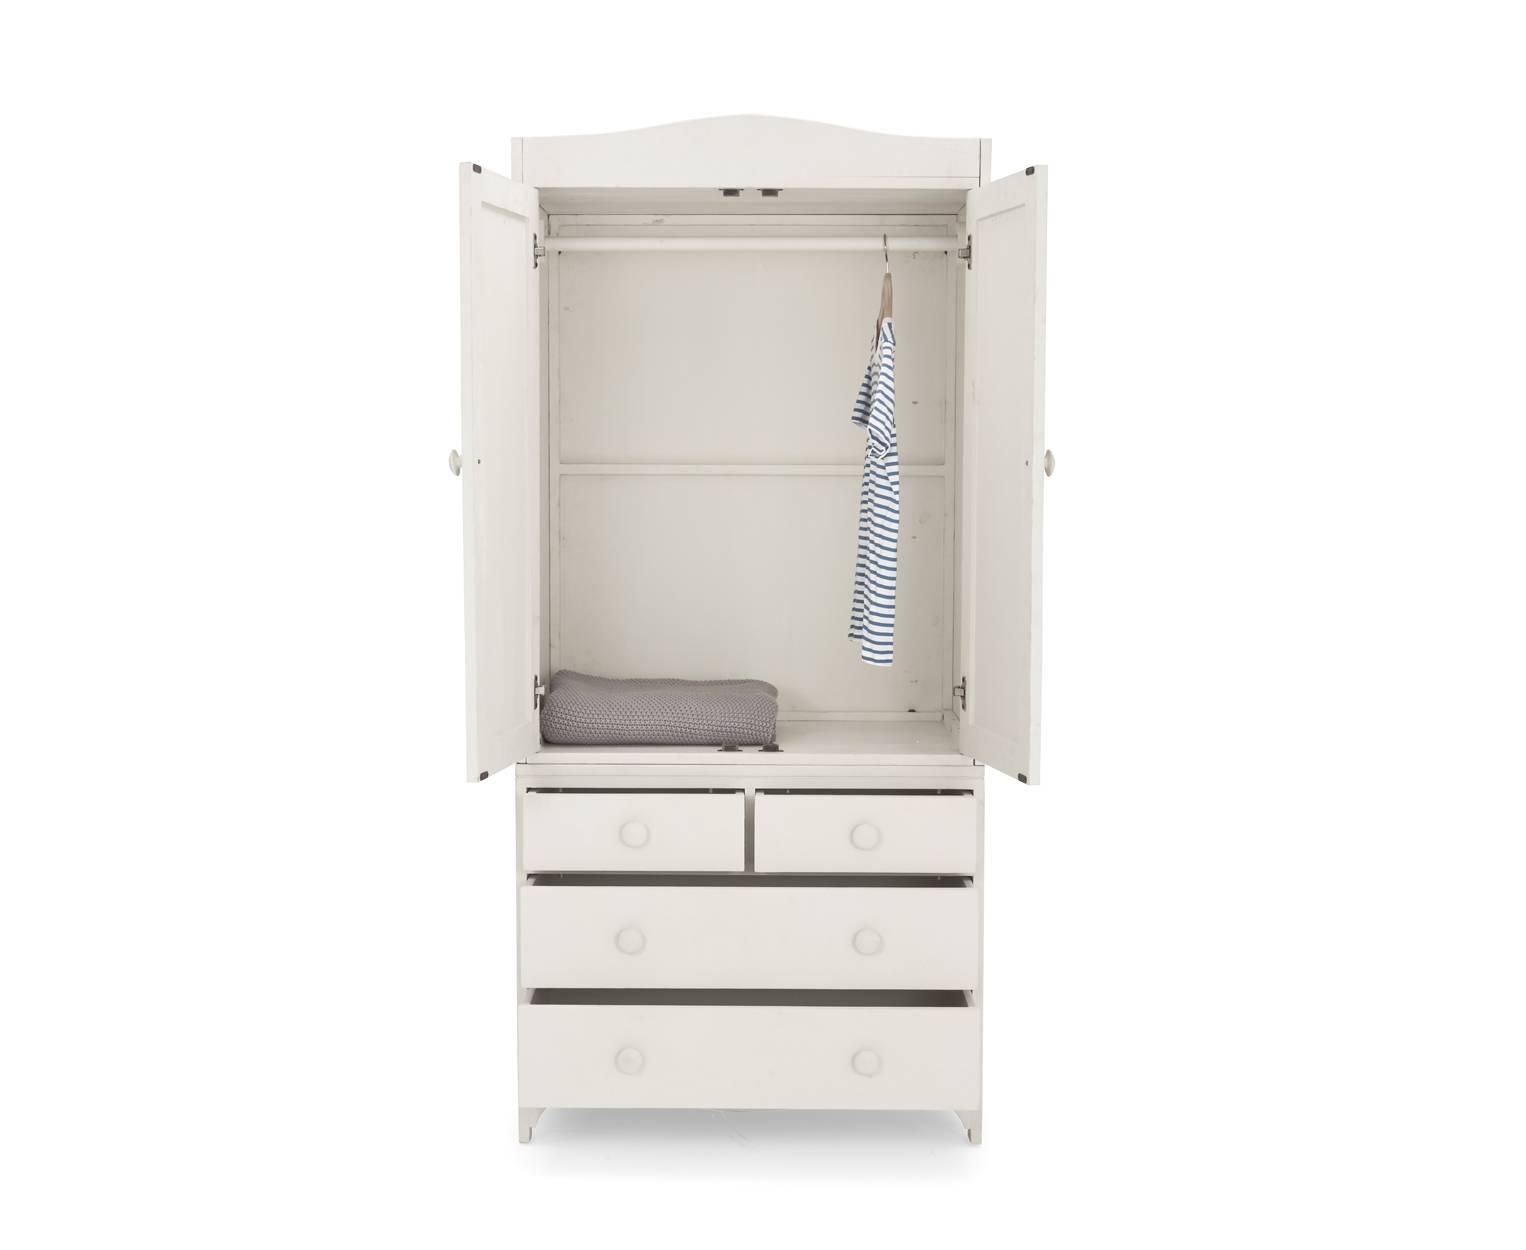 Tinks Kids' Wardrobe | Children's White Wardrobe | Loaf inside Childrens Wardrobes White (Image 13 of 15)